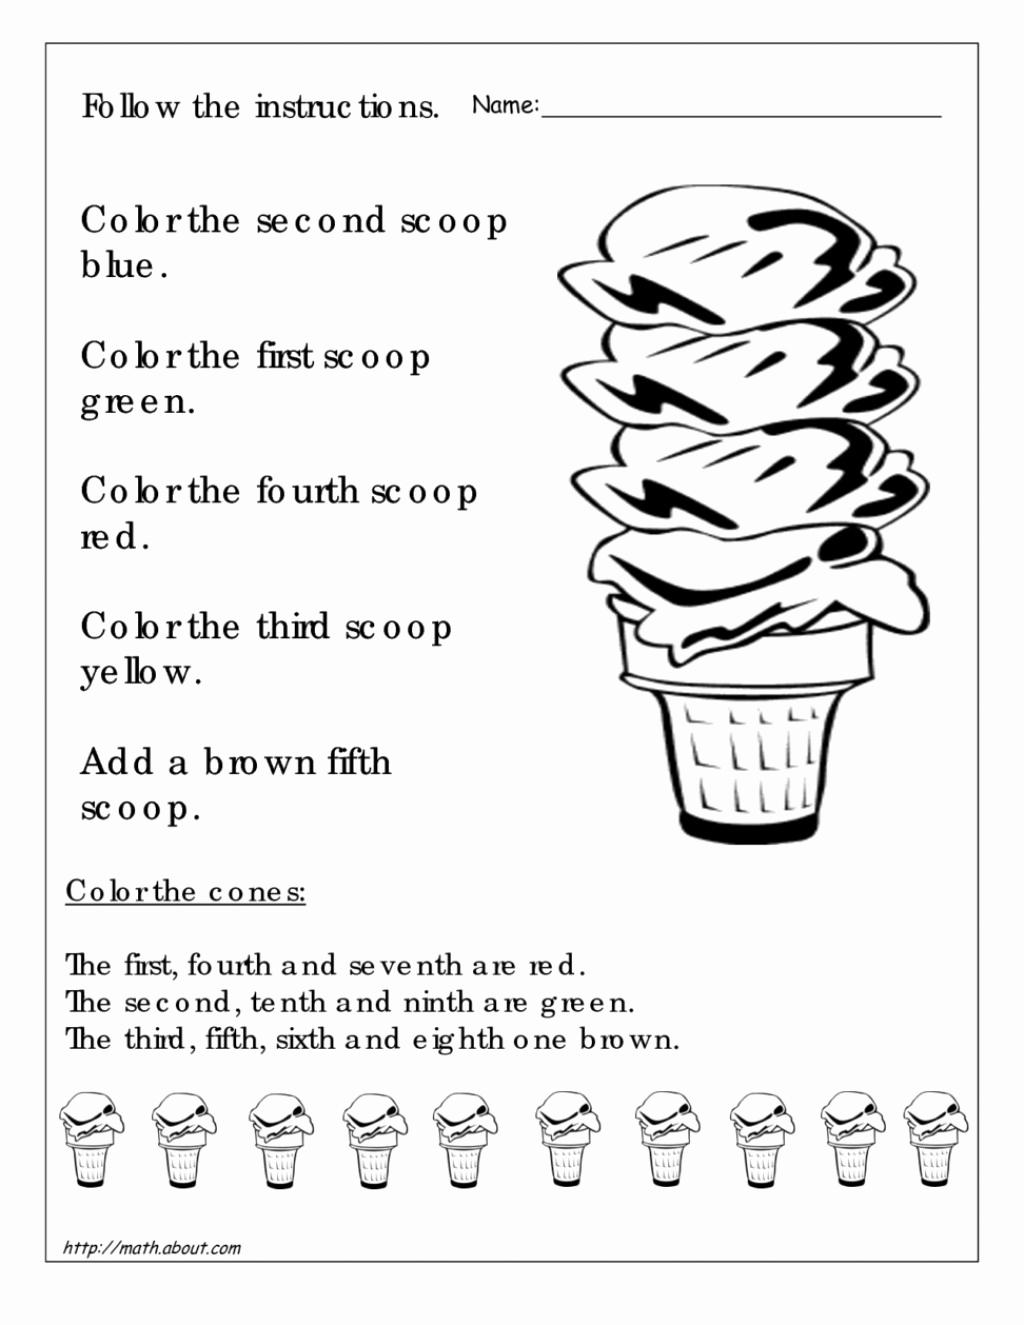 Science Worksheet 1st Grade Beautiful 1st Grade Worksheet Science for Print 1st Grade Worksheet